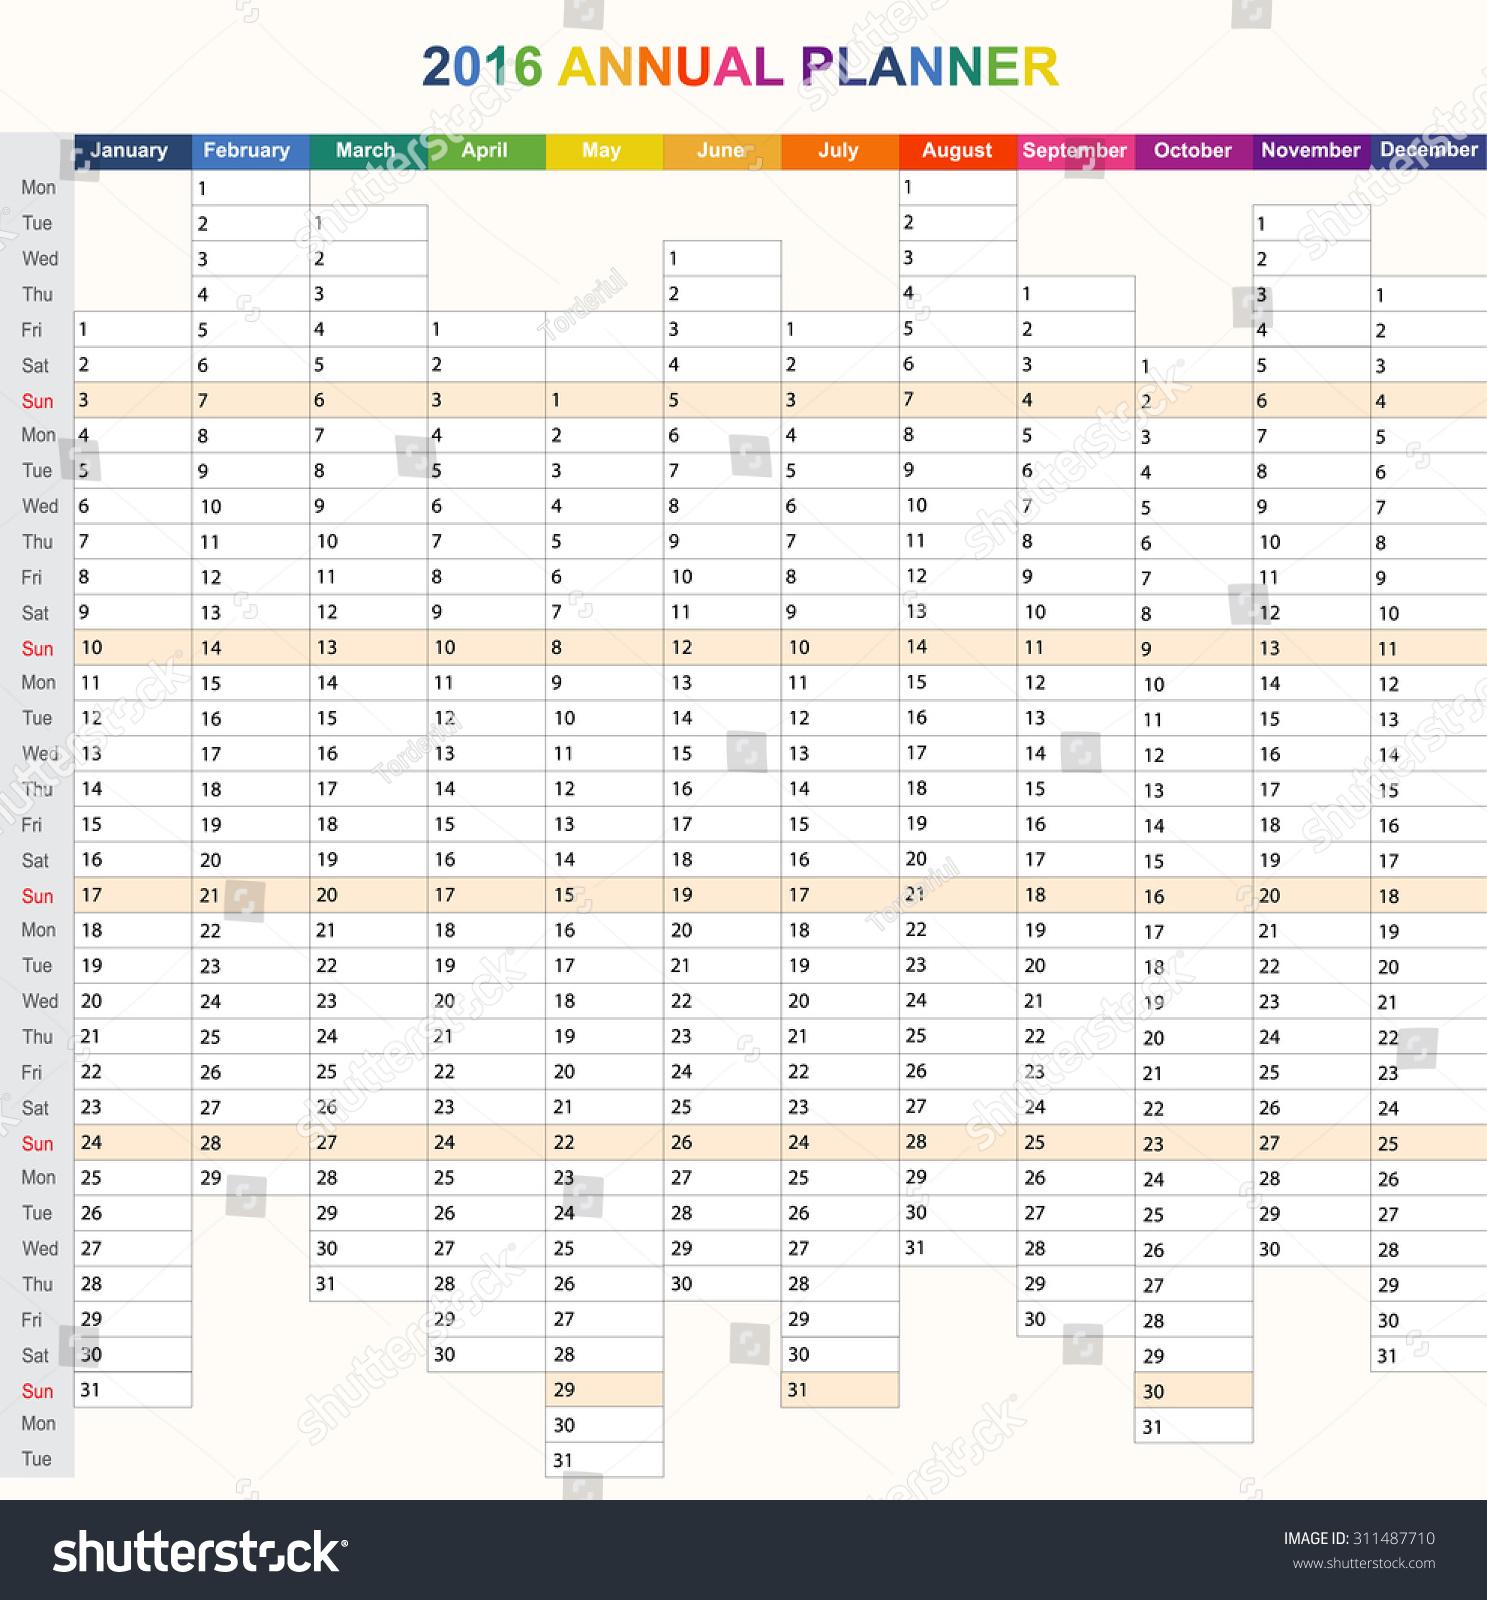 Daily Calendar Template 2016 : Daily weekly vector planner calendar stock